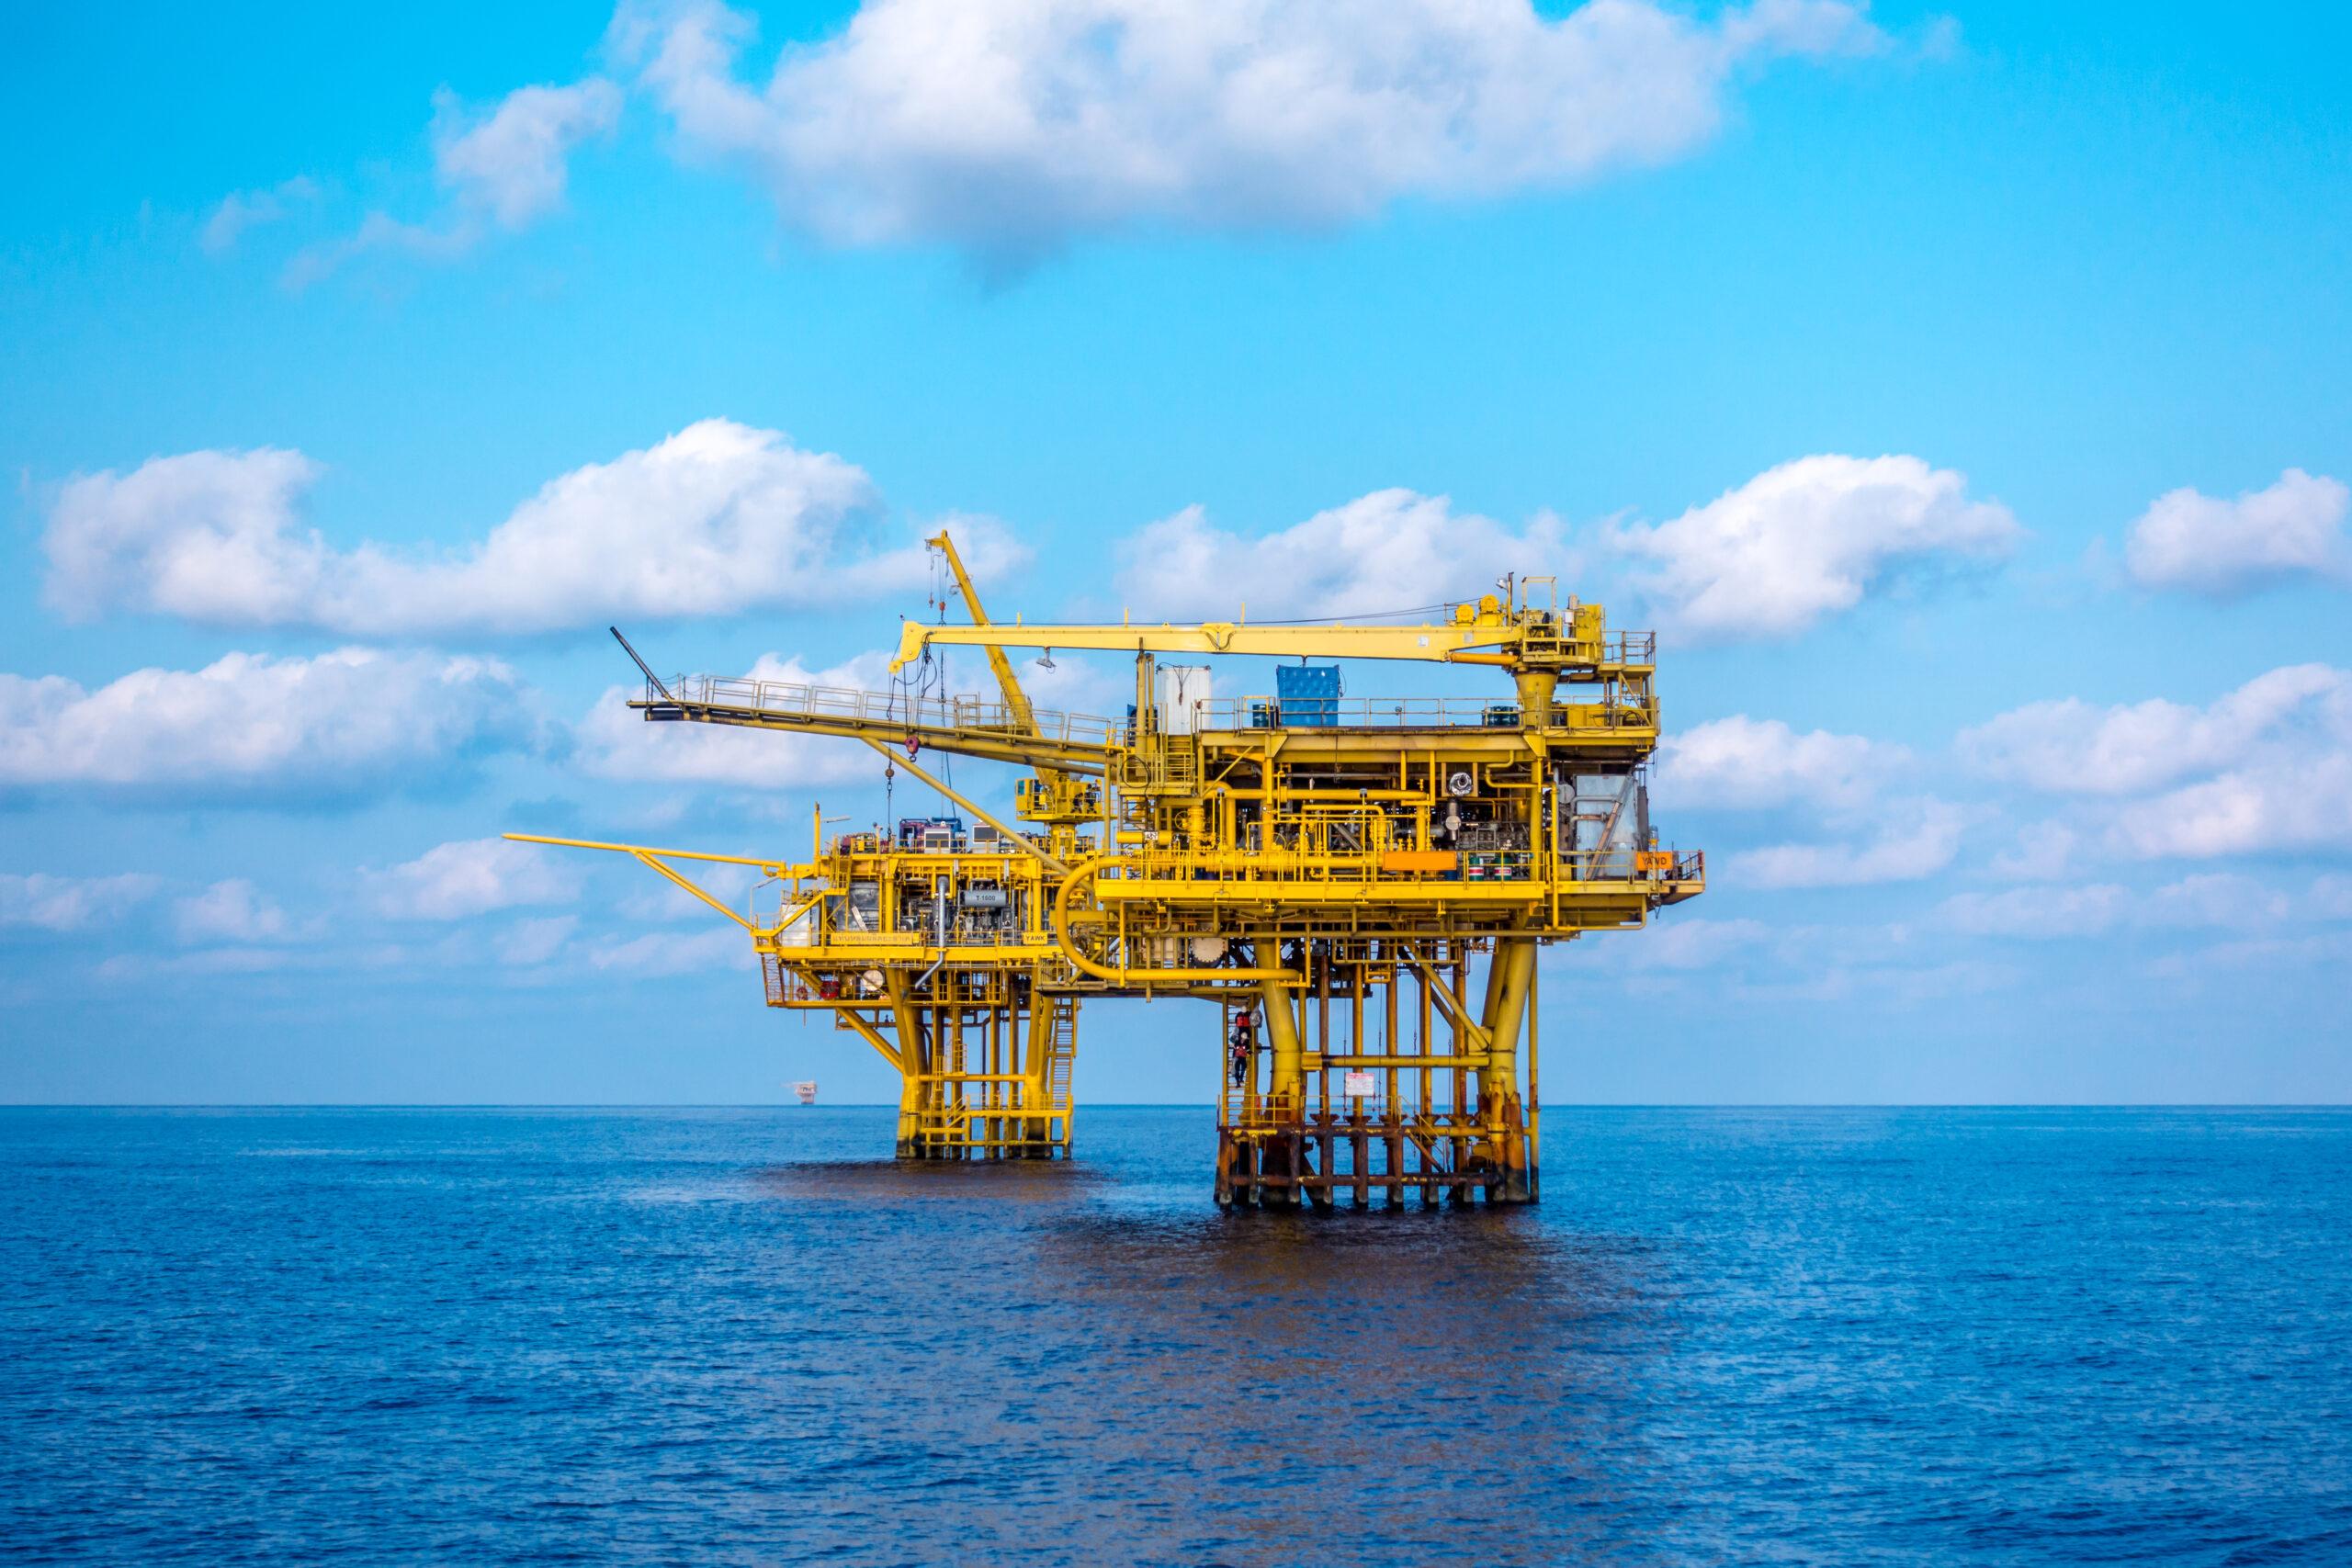 Oil/ gas platform MLG Instruments